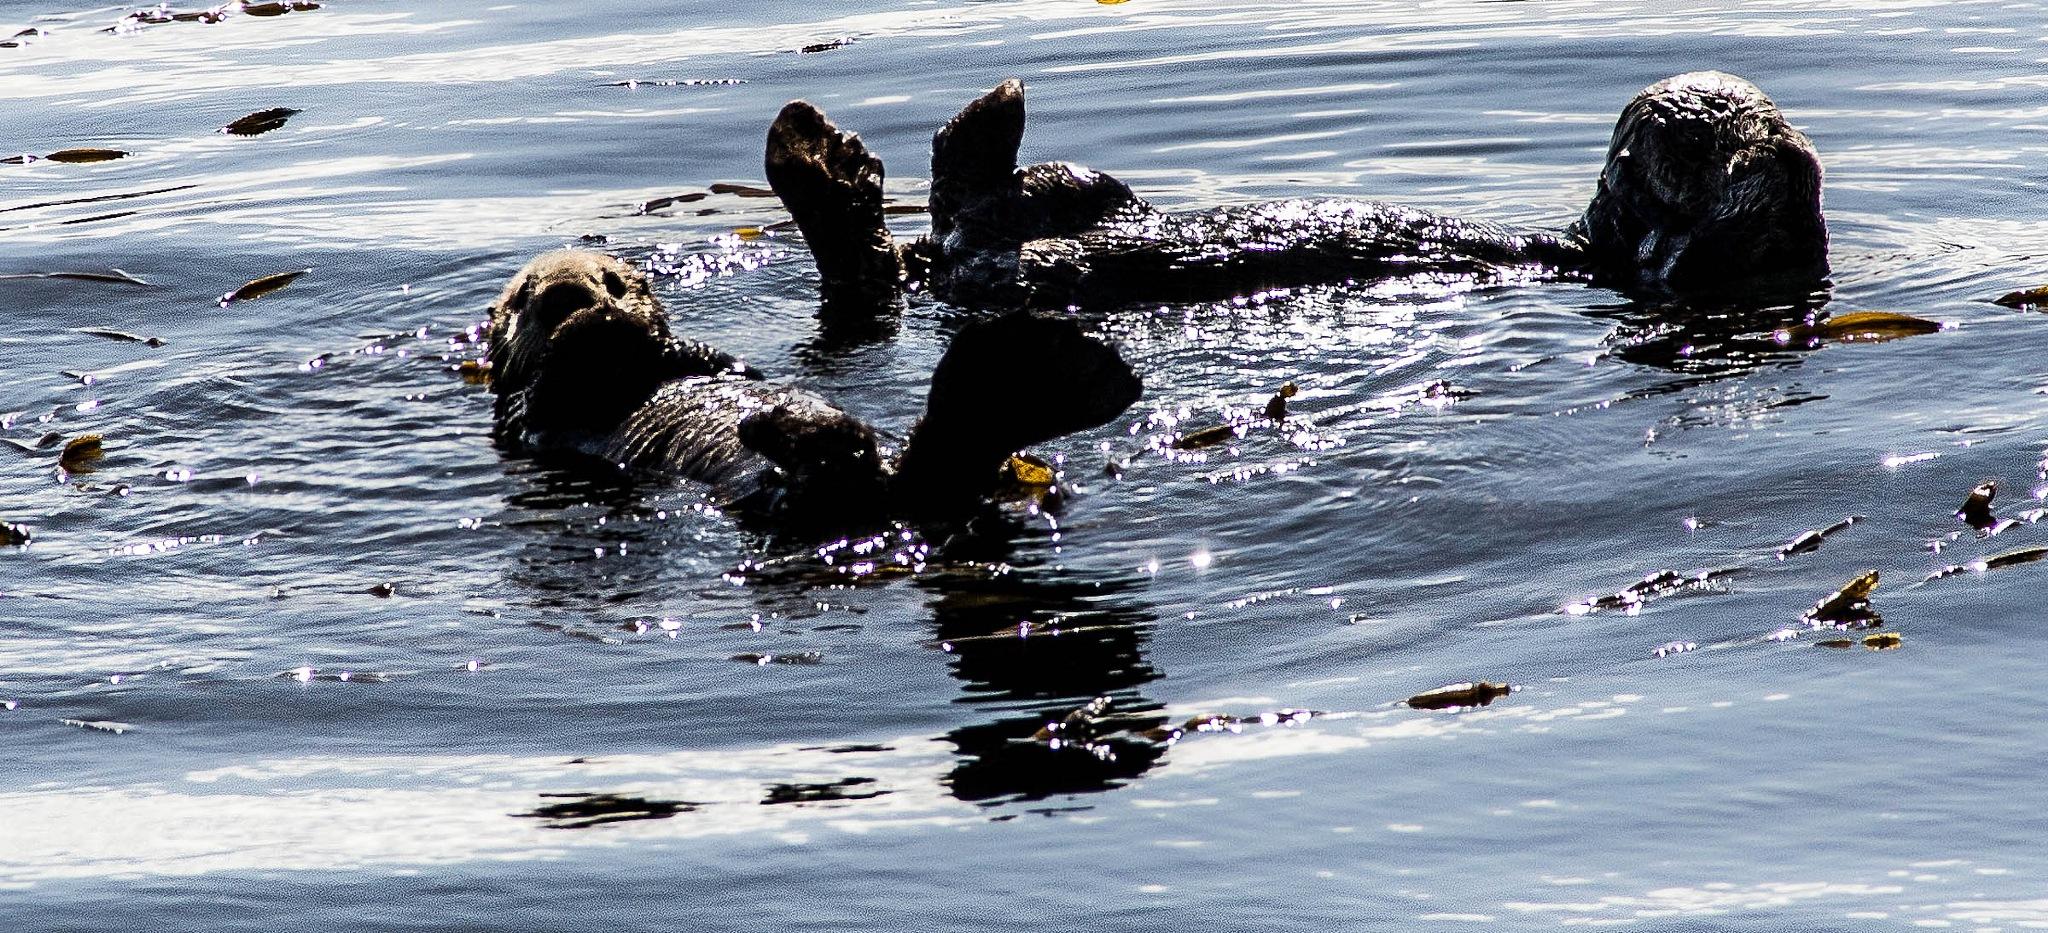 Momma Teach Me to Swim by Jason Graefen